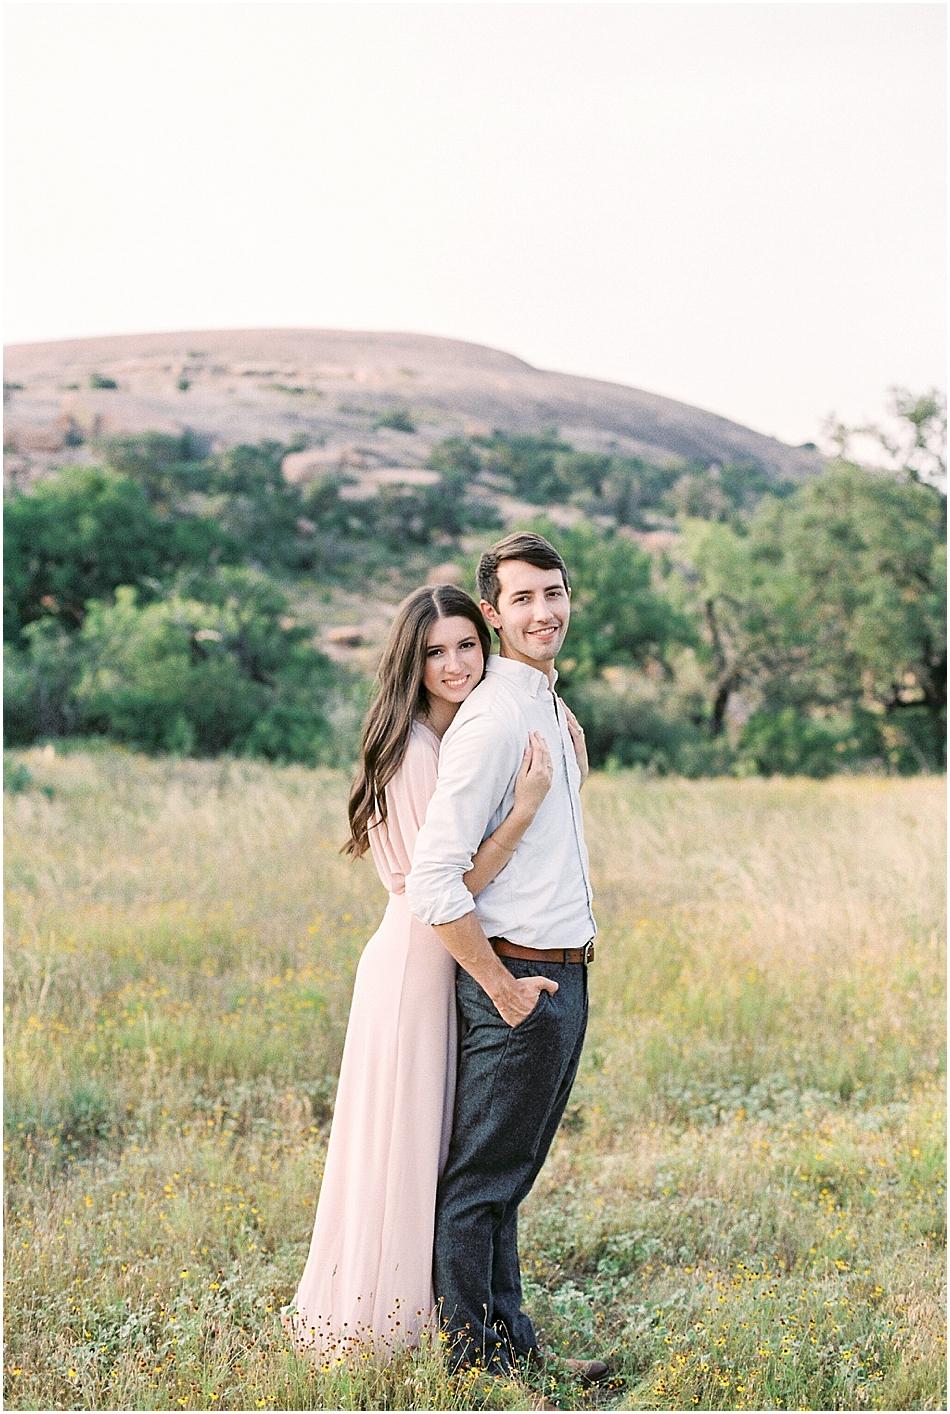 Emilie Anne Photography | Fine Art Film | Featured | Magnolia Rouge | Central Texas-13.jpg